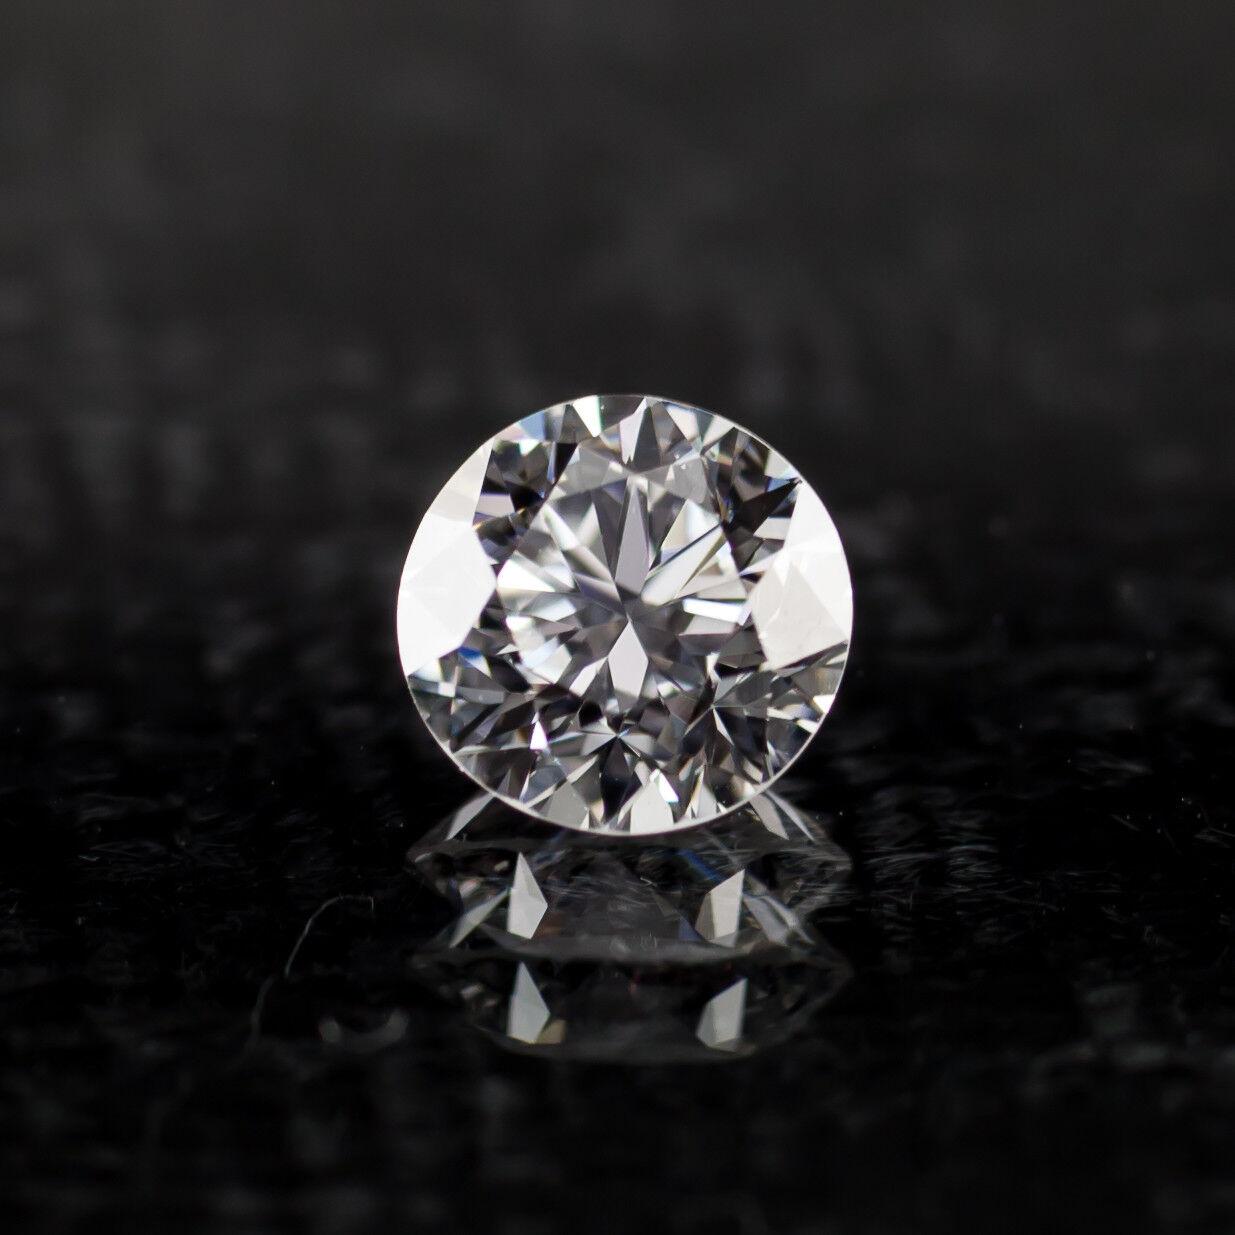 0.75 Carat Loose D / VS2 Round Brilliant Cut Diamond GIA Certified